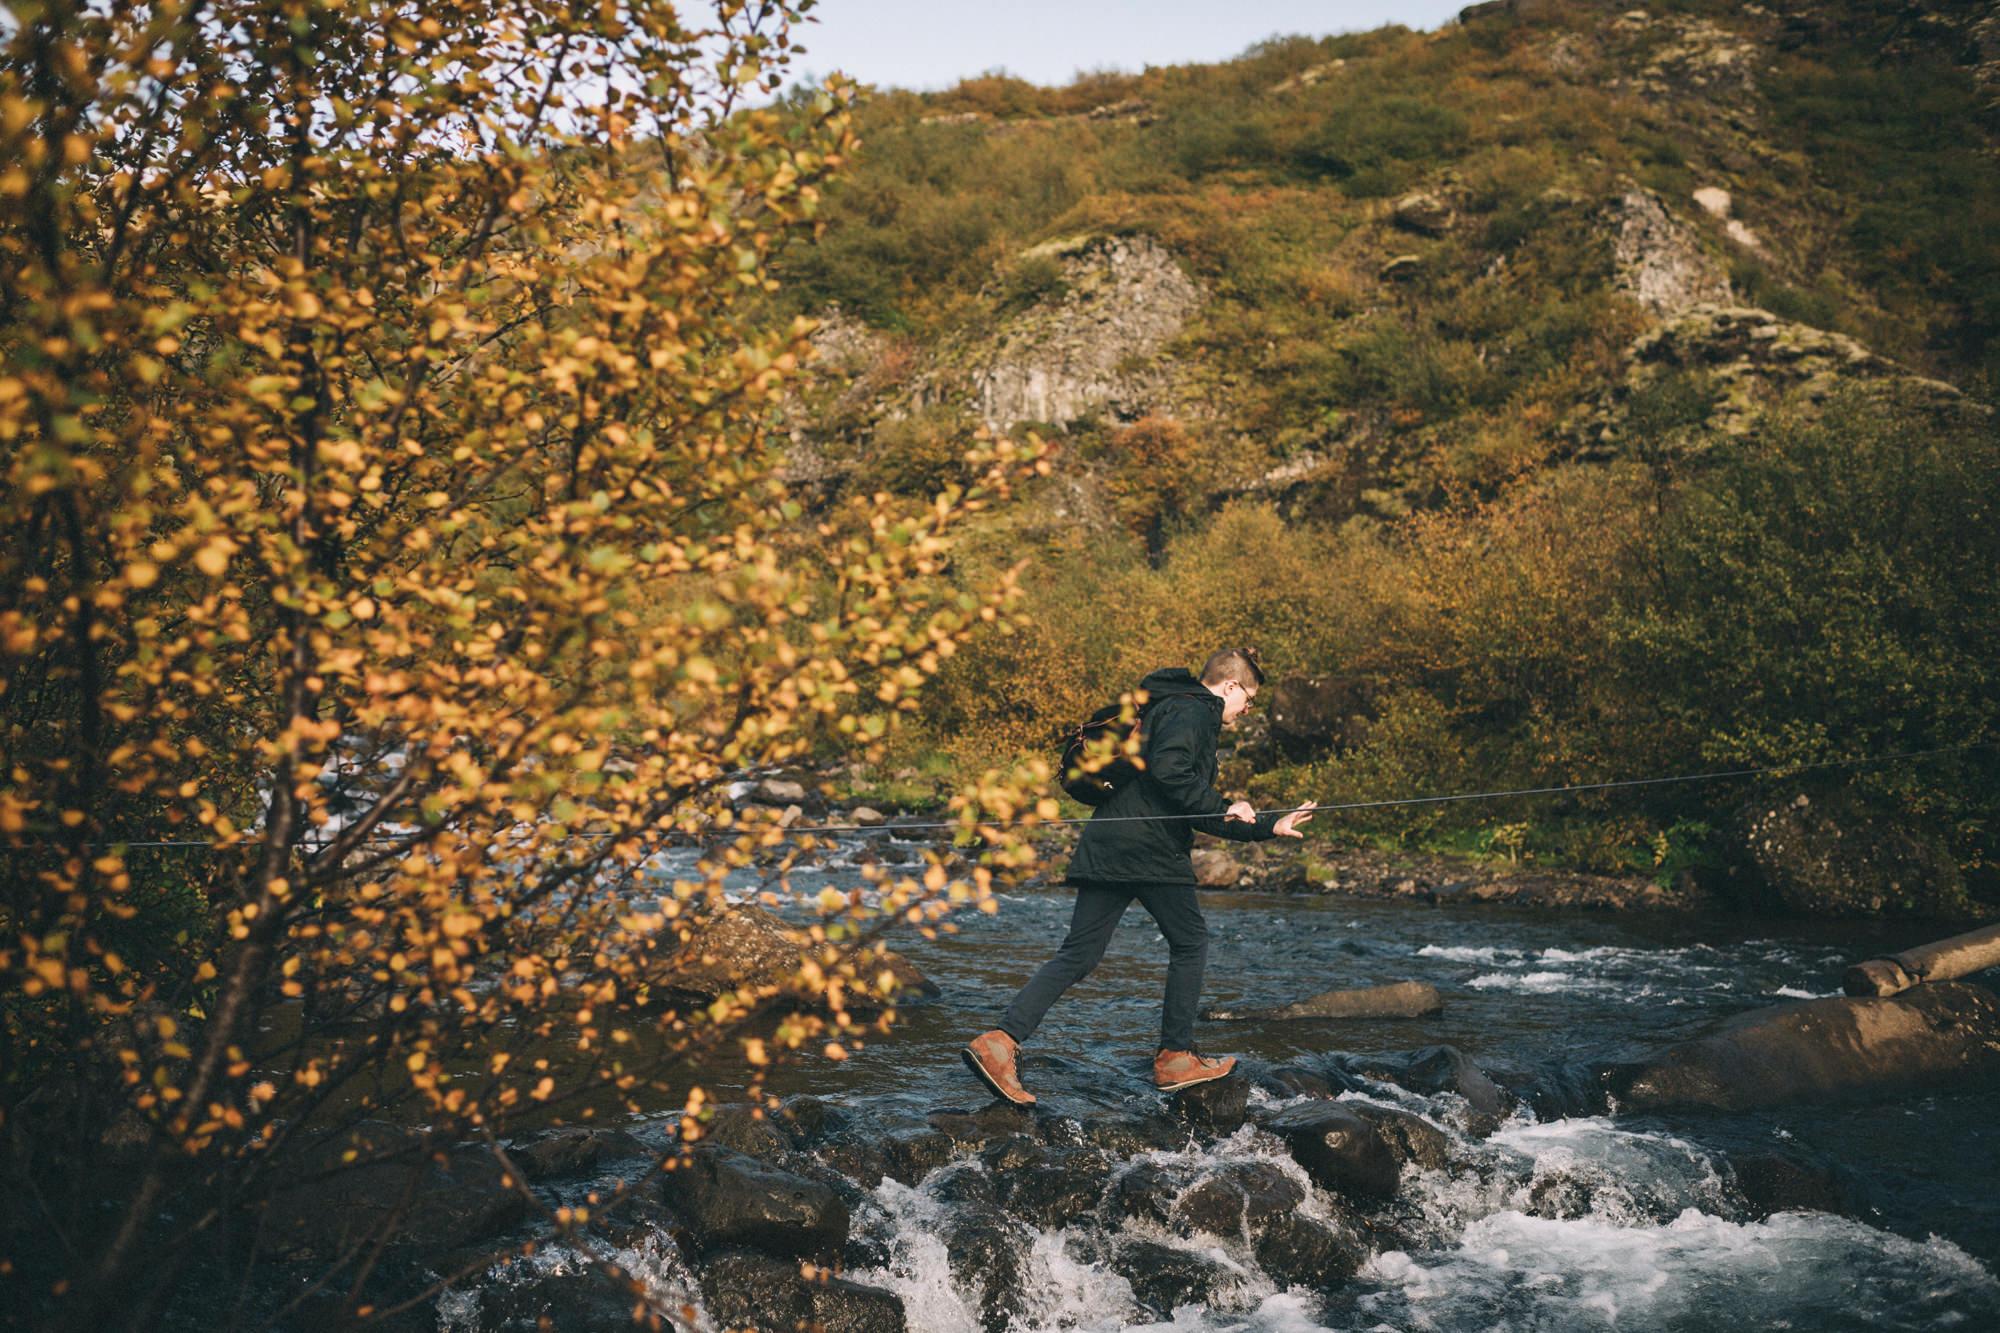 Sarah-Katherine-Davis-Photography-Iceland-Adventure-Elopement-Photographer-Louisville-Kentucky-Wedding-Photographer-Travel-Vik-Beach-Engagement-Session-Cozy-Iceland-South-Coast-243edit.jpg